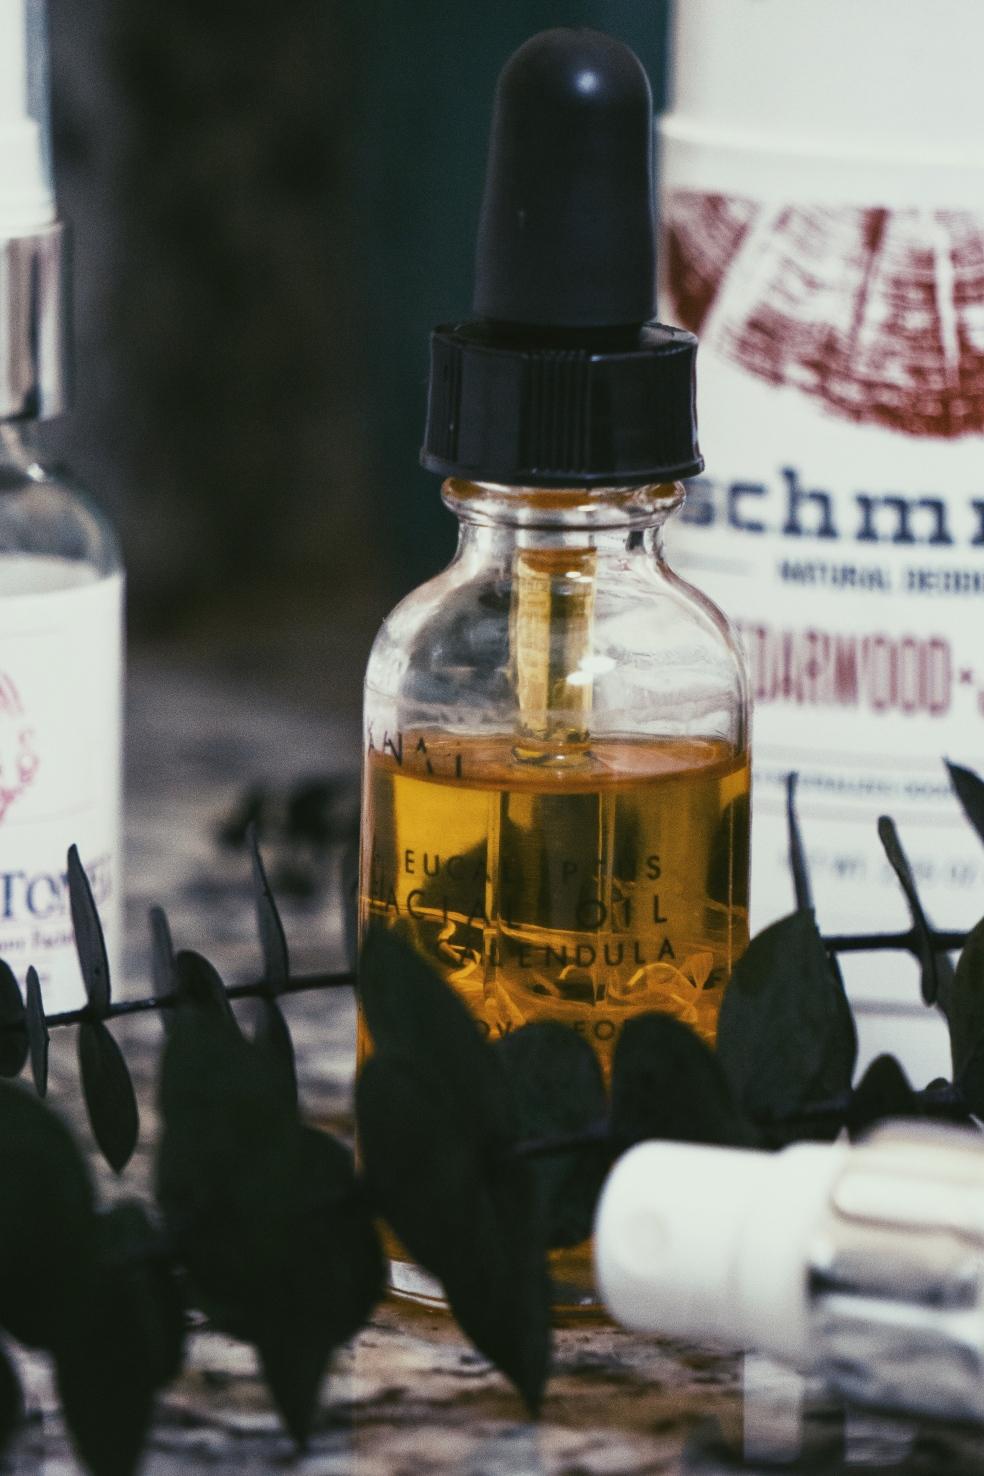 Kanai Essentials Botanical Eucalyptus and Tea Tree Repair Oil